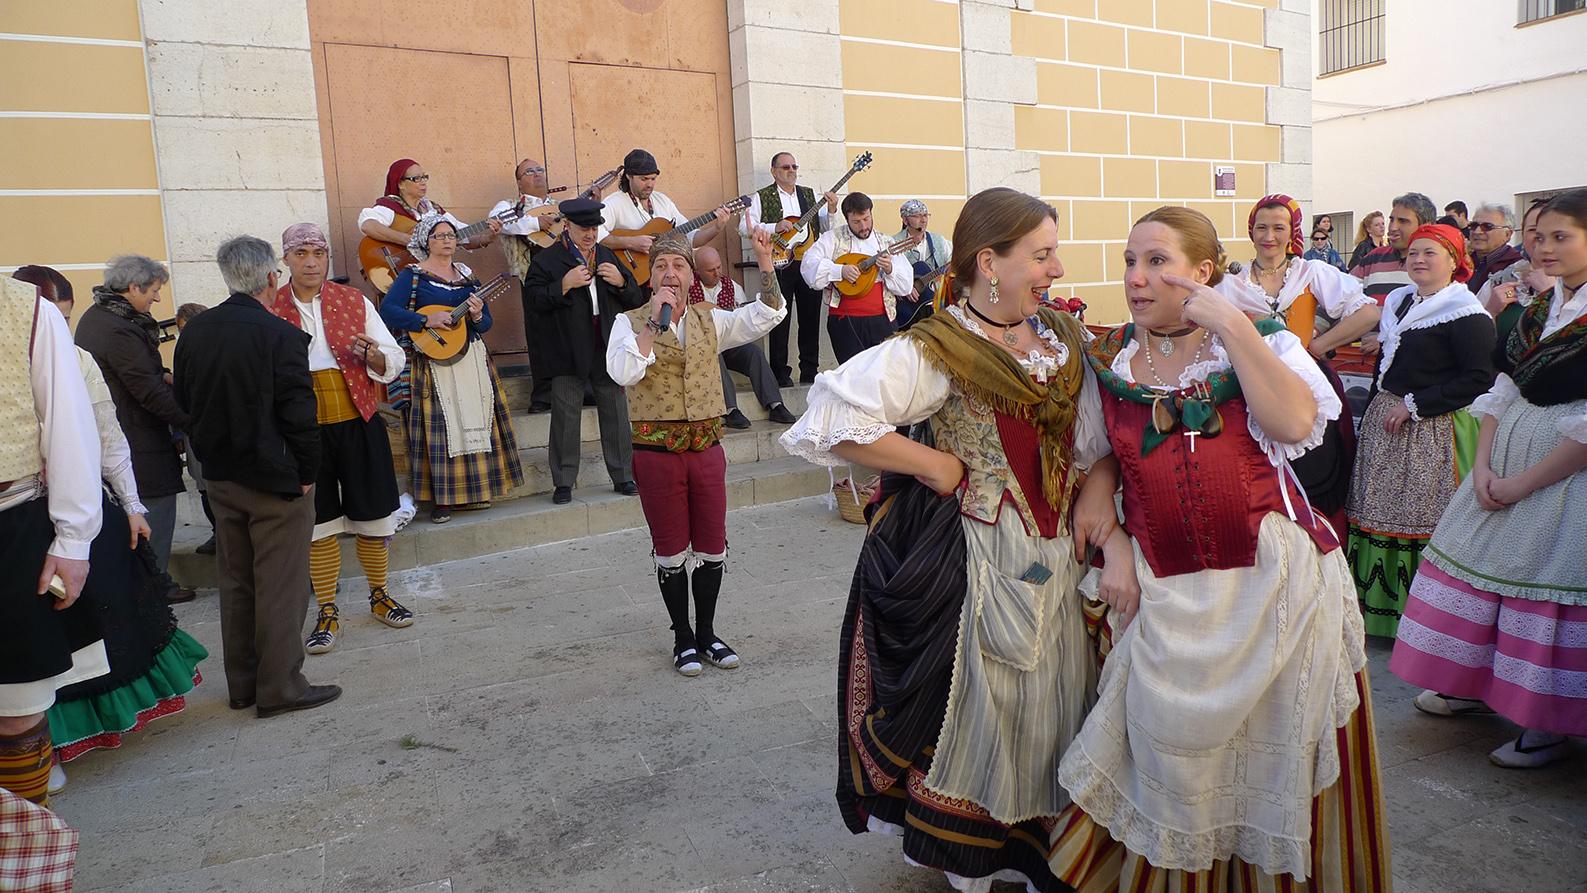 2014-02-23 - Baladre a Fira St. Marcia-ROTOVA (50)